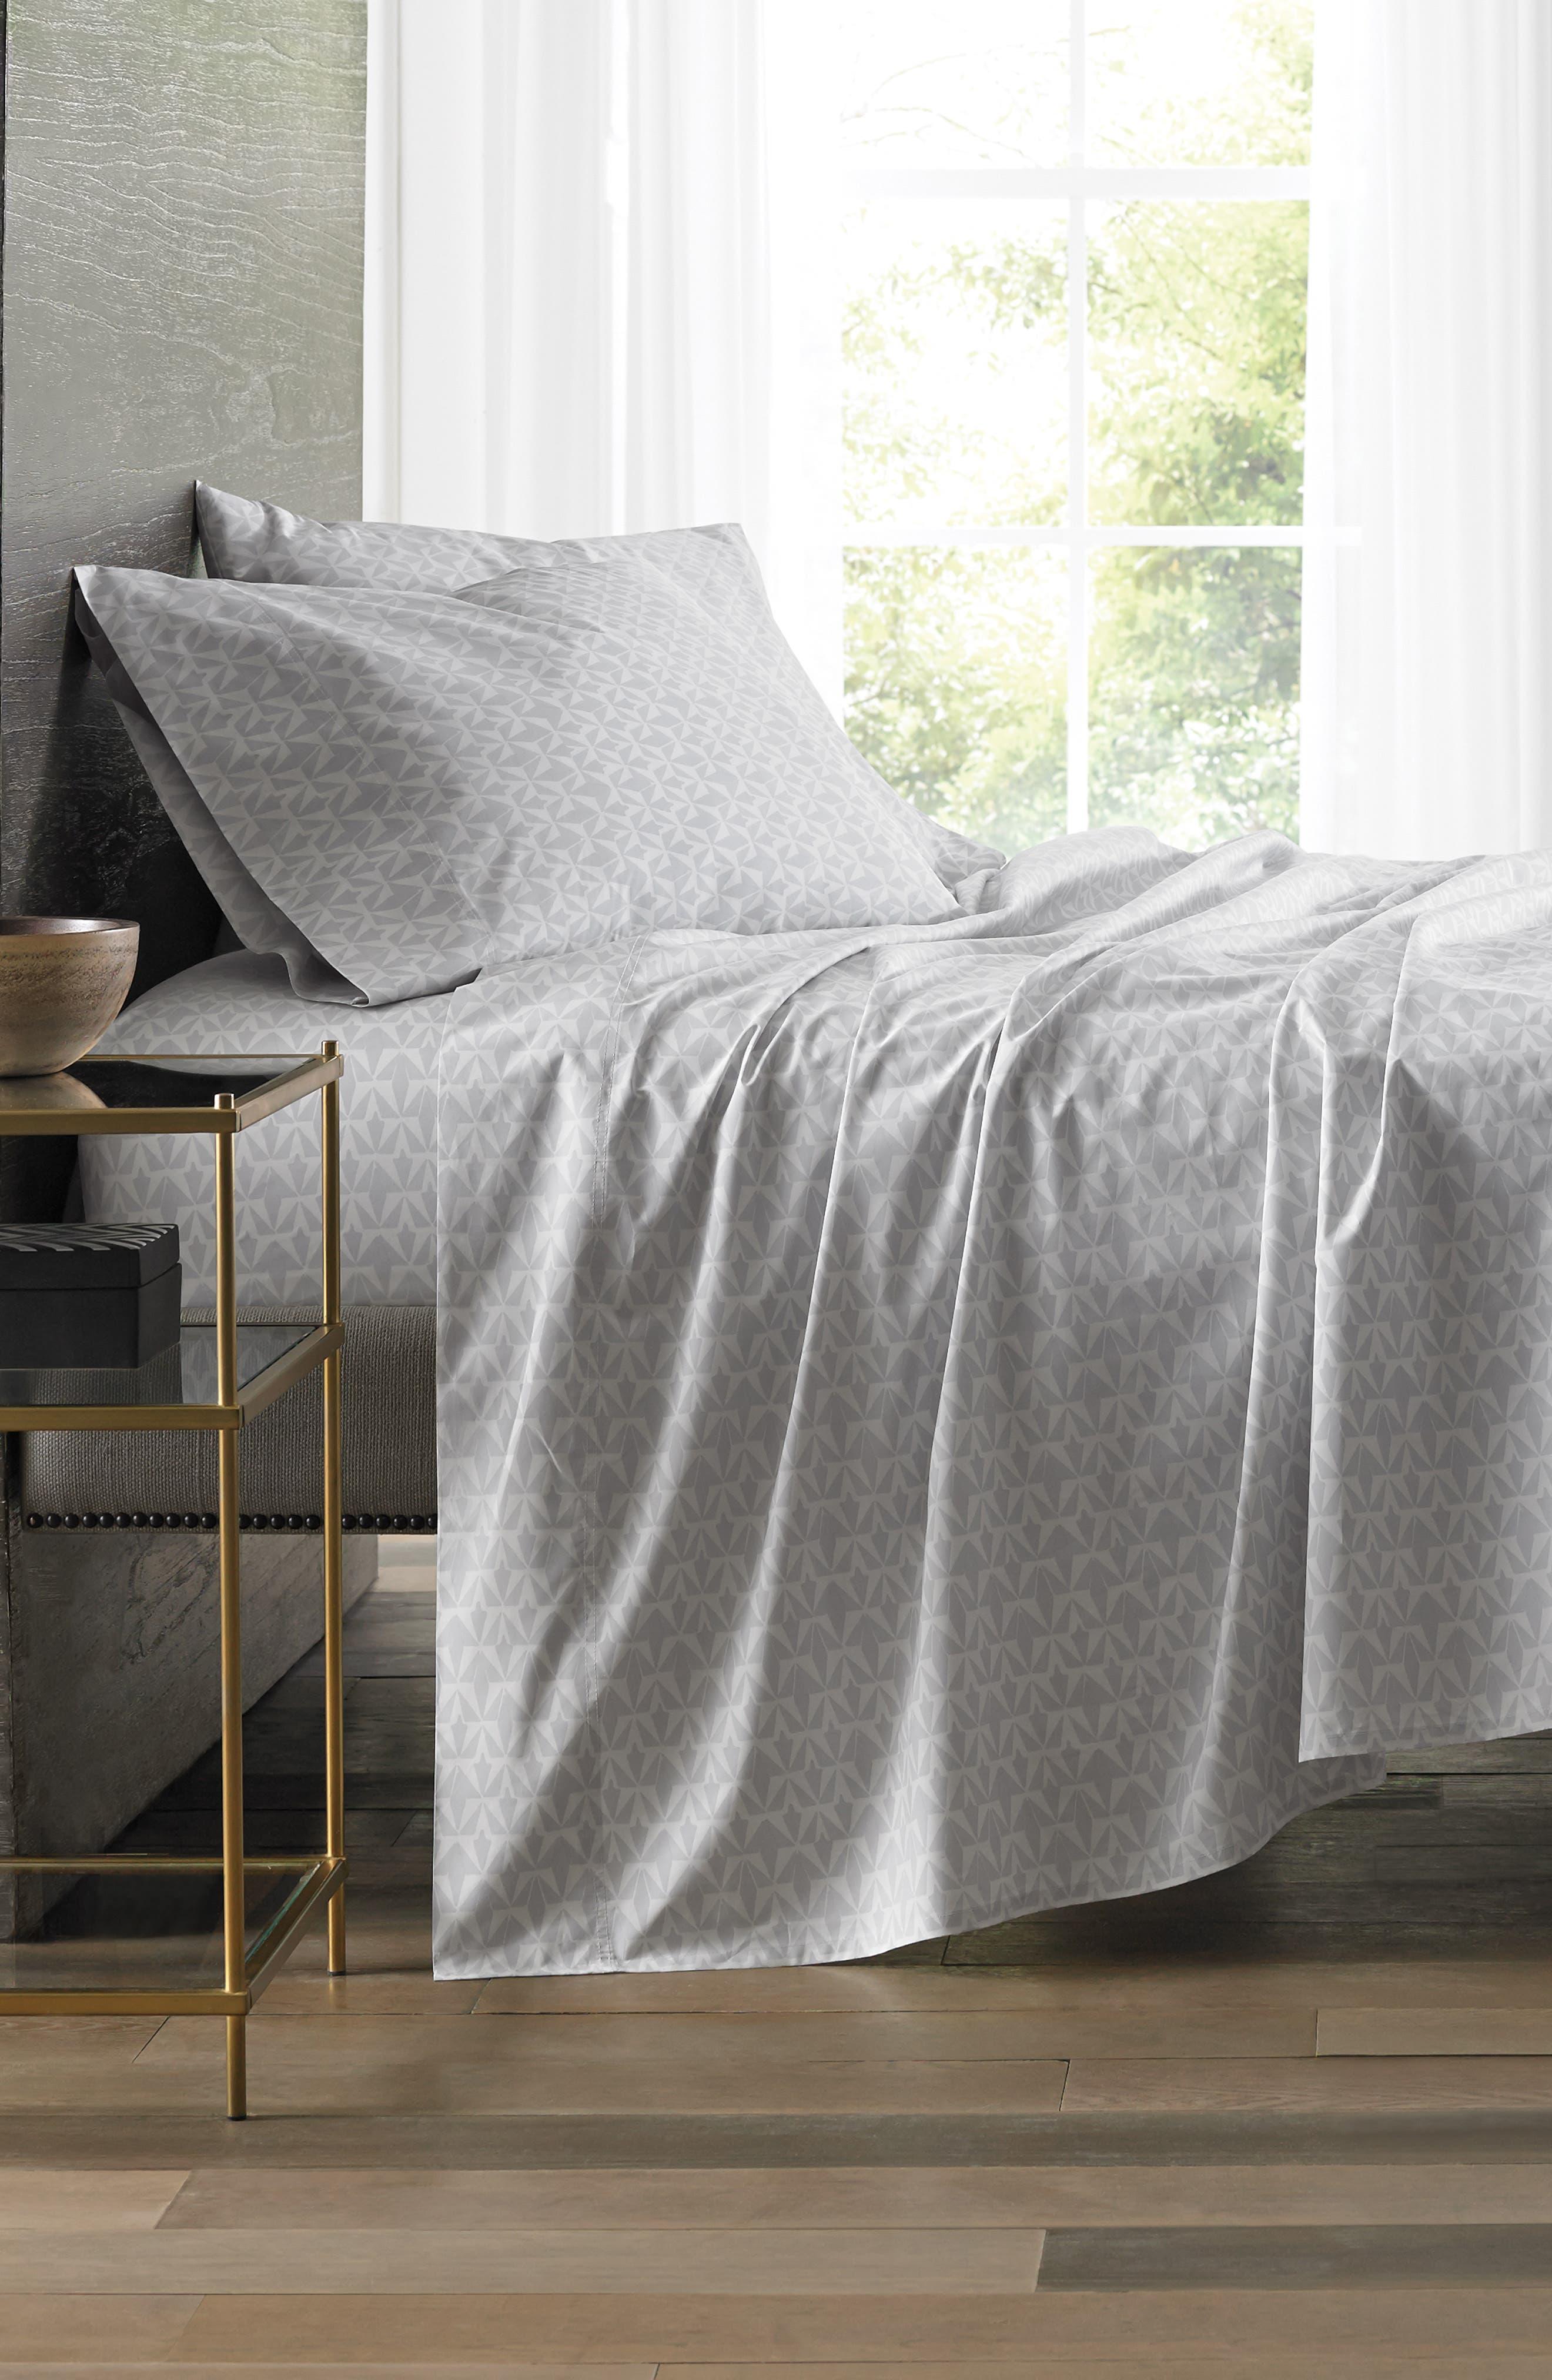 Grasslands 300 Thread Count Pair of Pillowcases,                             Alternate thumbnail 4, color,                             Nibus/ Light/ Pastel Grey